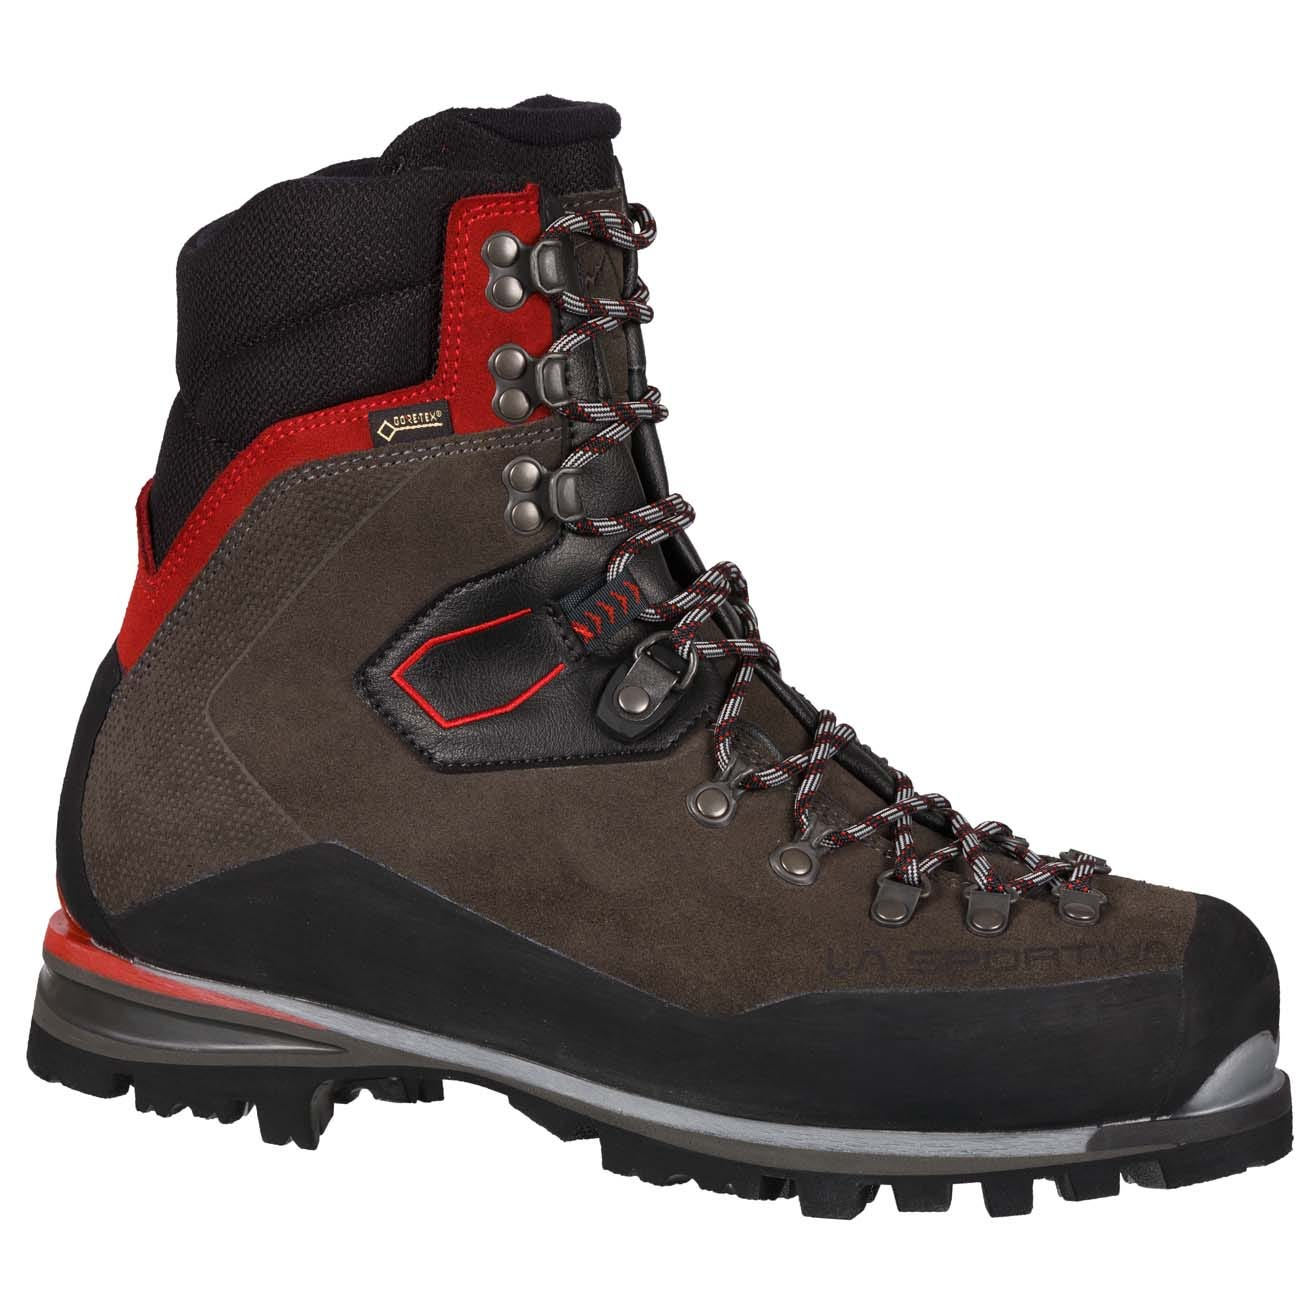 la-sportiva-karakorum-evo-gtx-m-anthracite-red-chaussure-montagne-homme-1